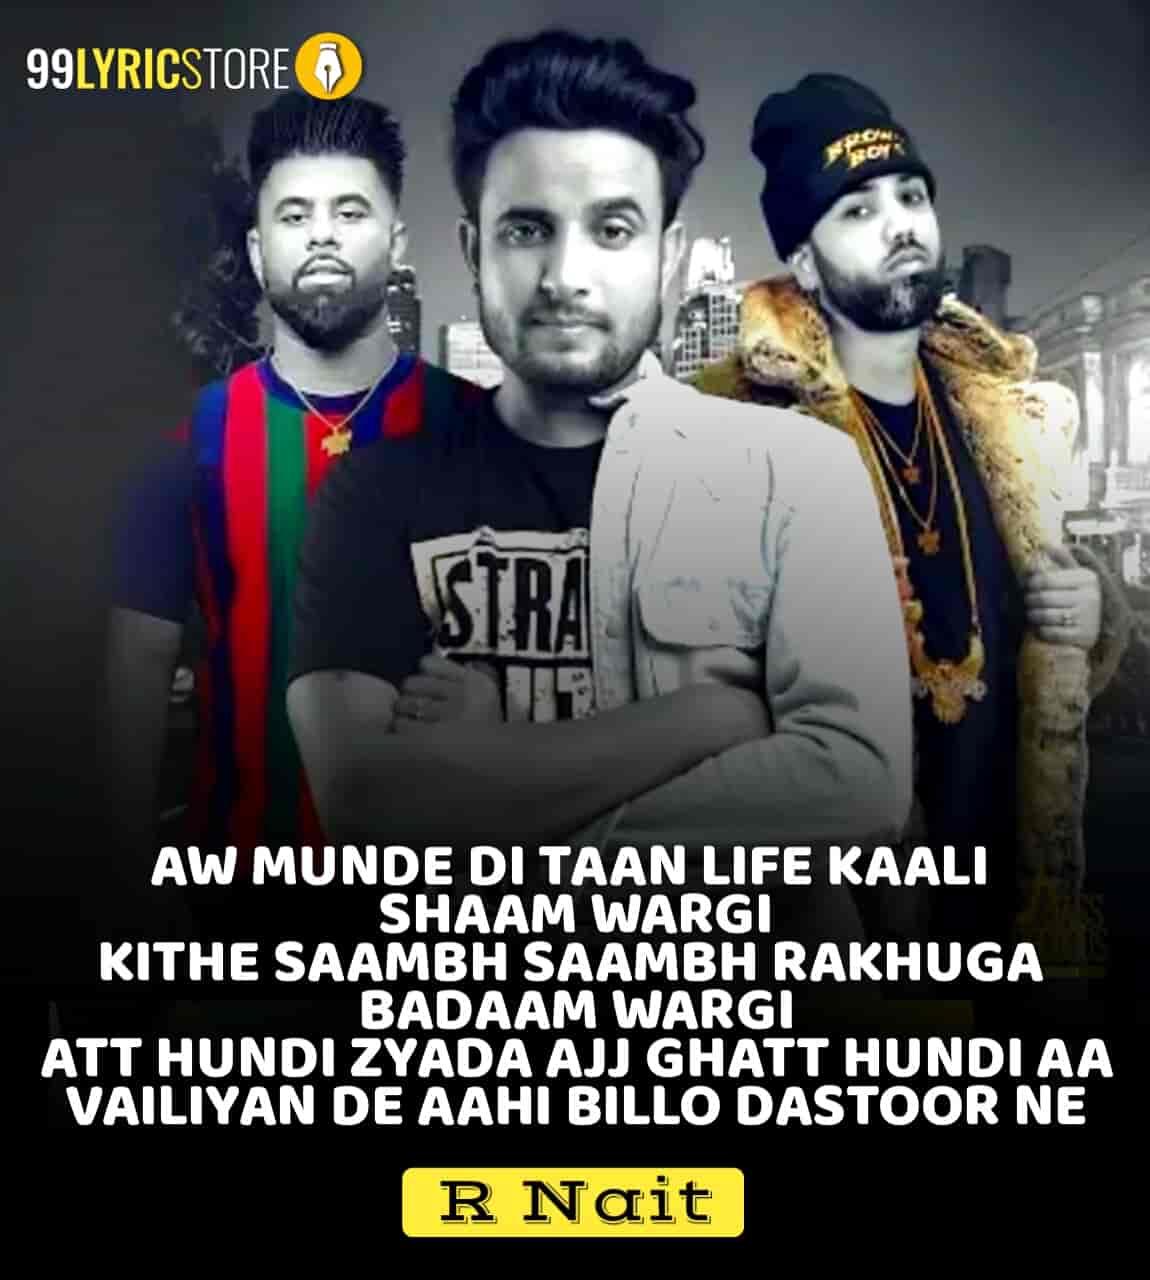 Red Battiyaan Punjabi Song Sung by R Nait Ft. Sunny Malton